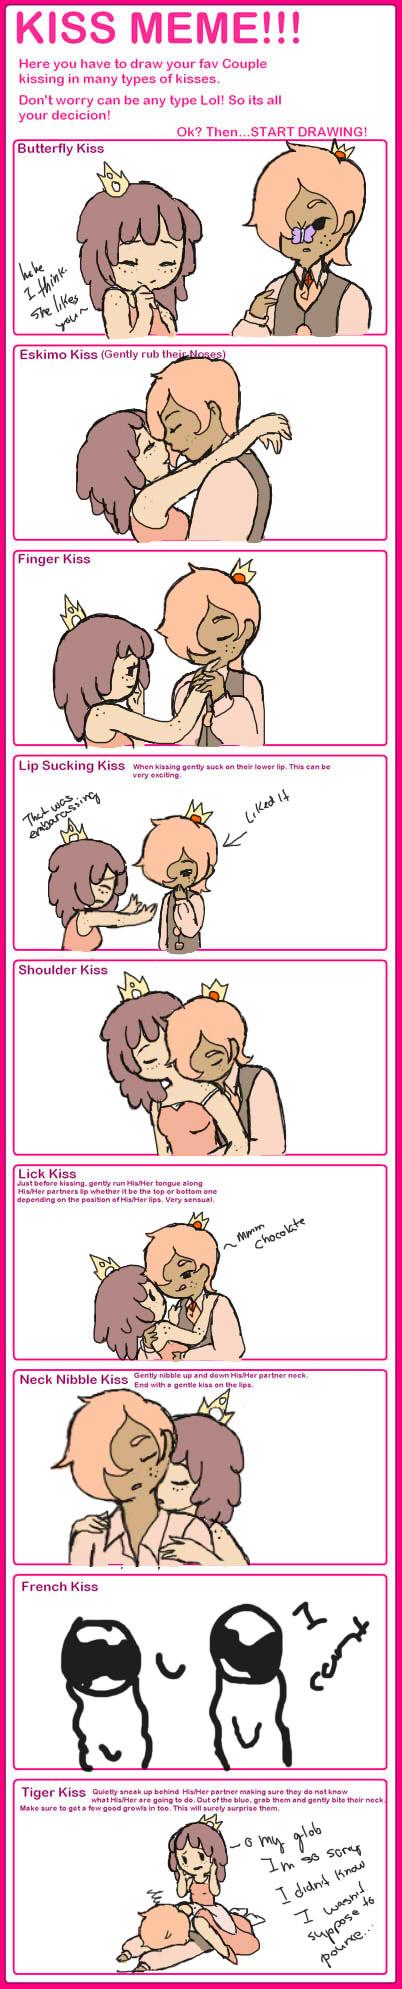 Kiss meme JakielXMariaBella by GingerQuin